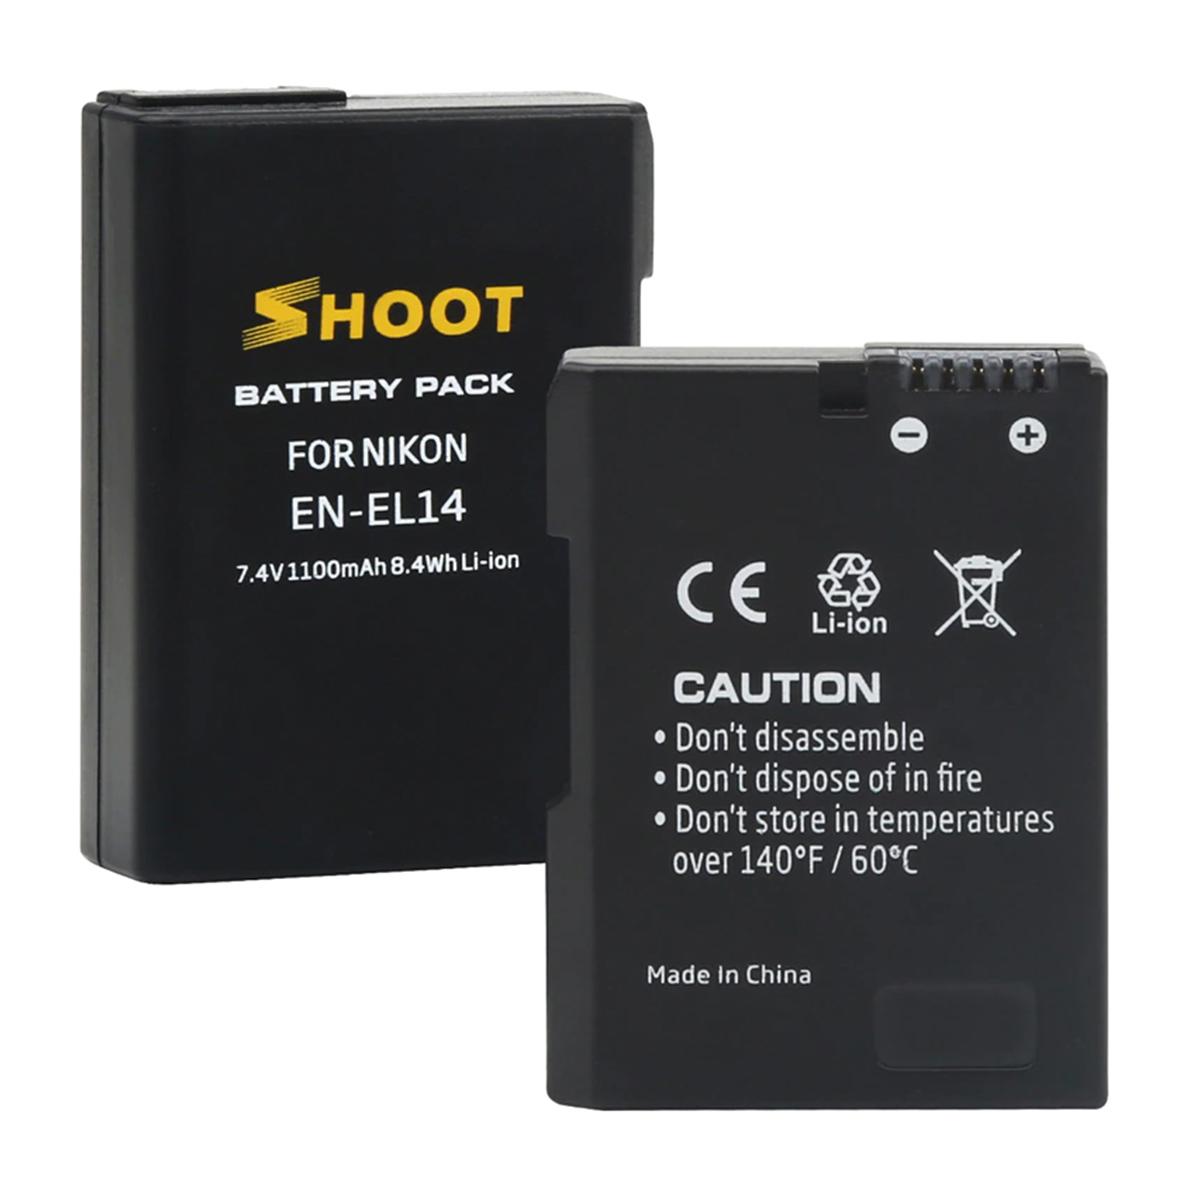 Kit com Carregador Duplo e Duas Baterias - EN-EL14